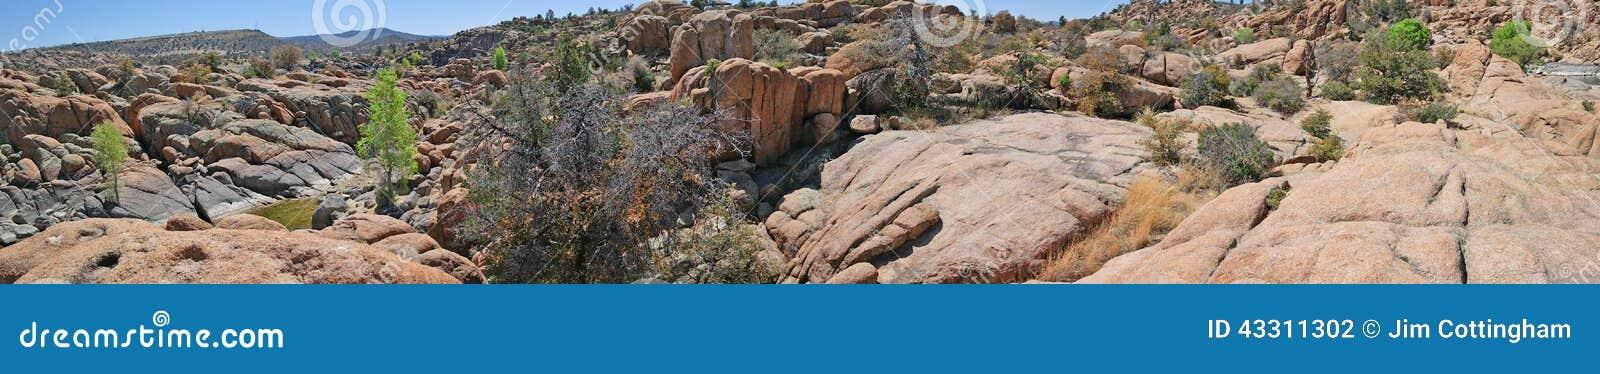 Granite Dells Landscape, Prescott, AZ Panorama